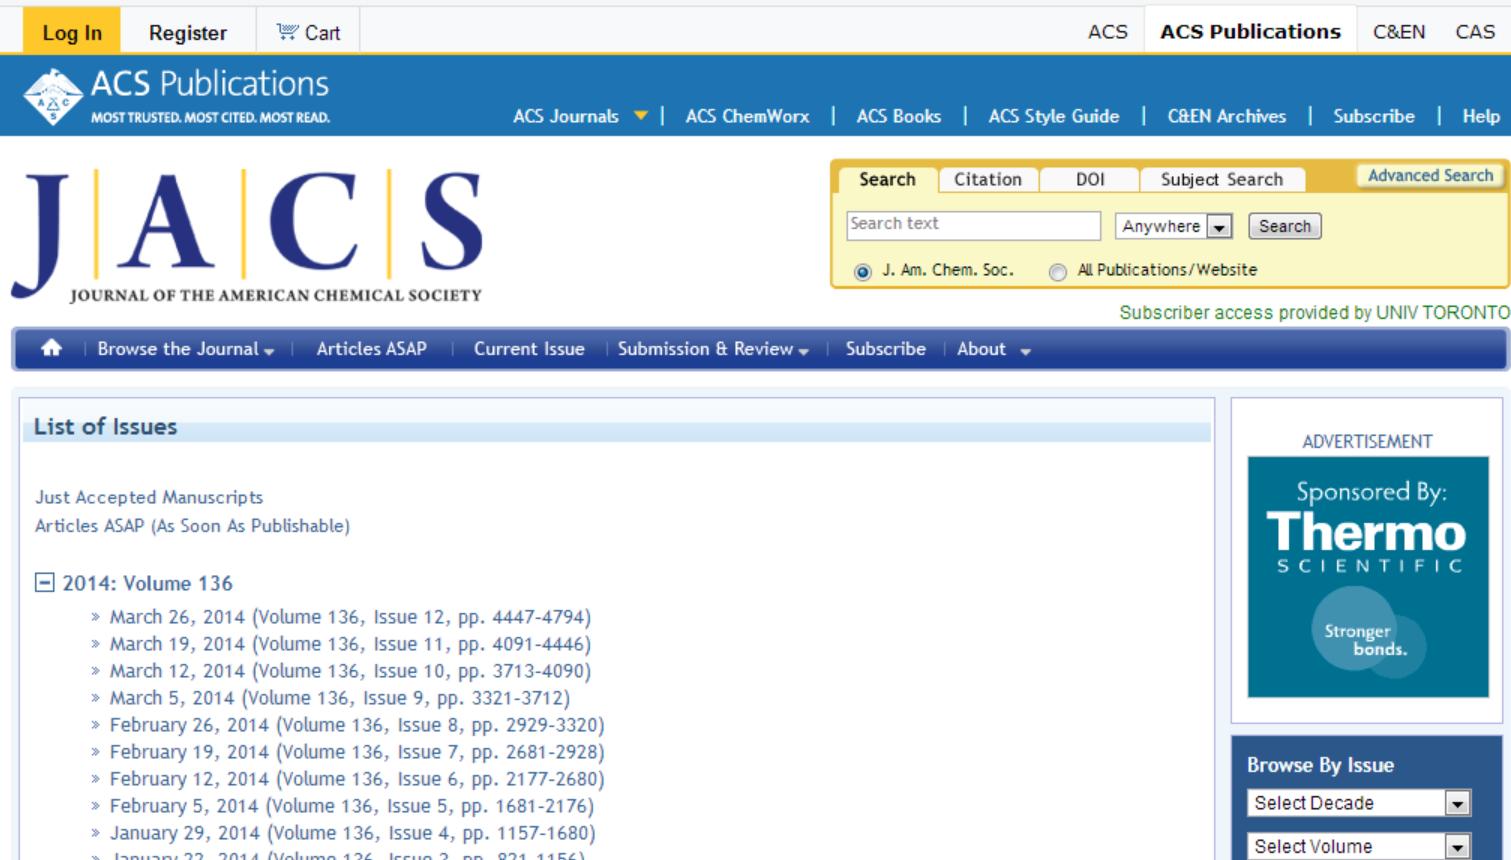 JACS homepage